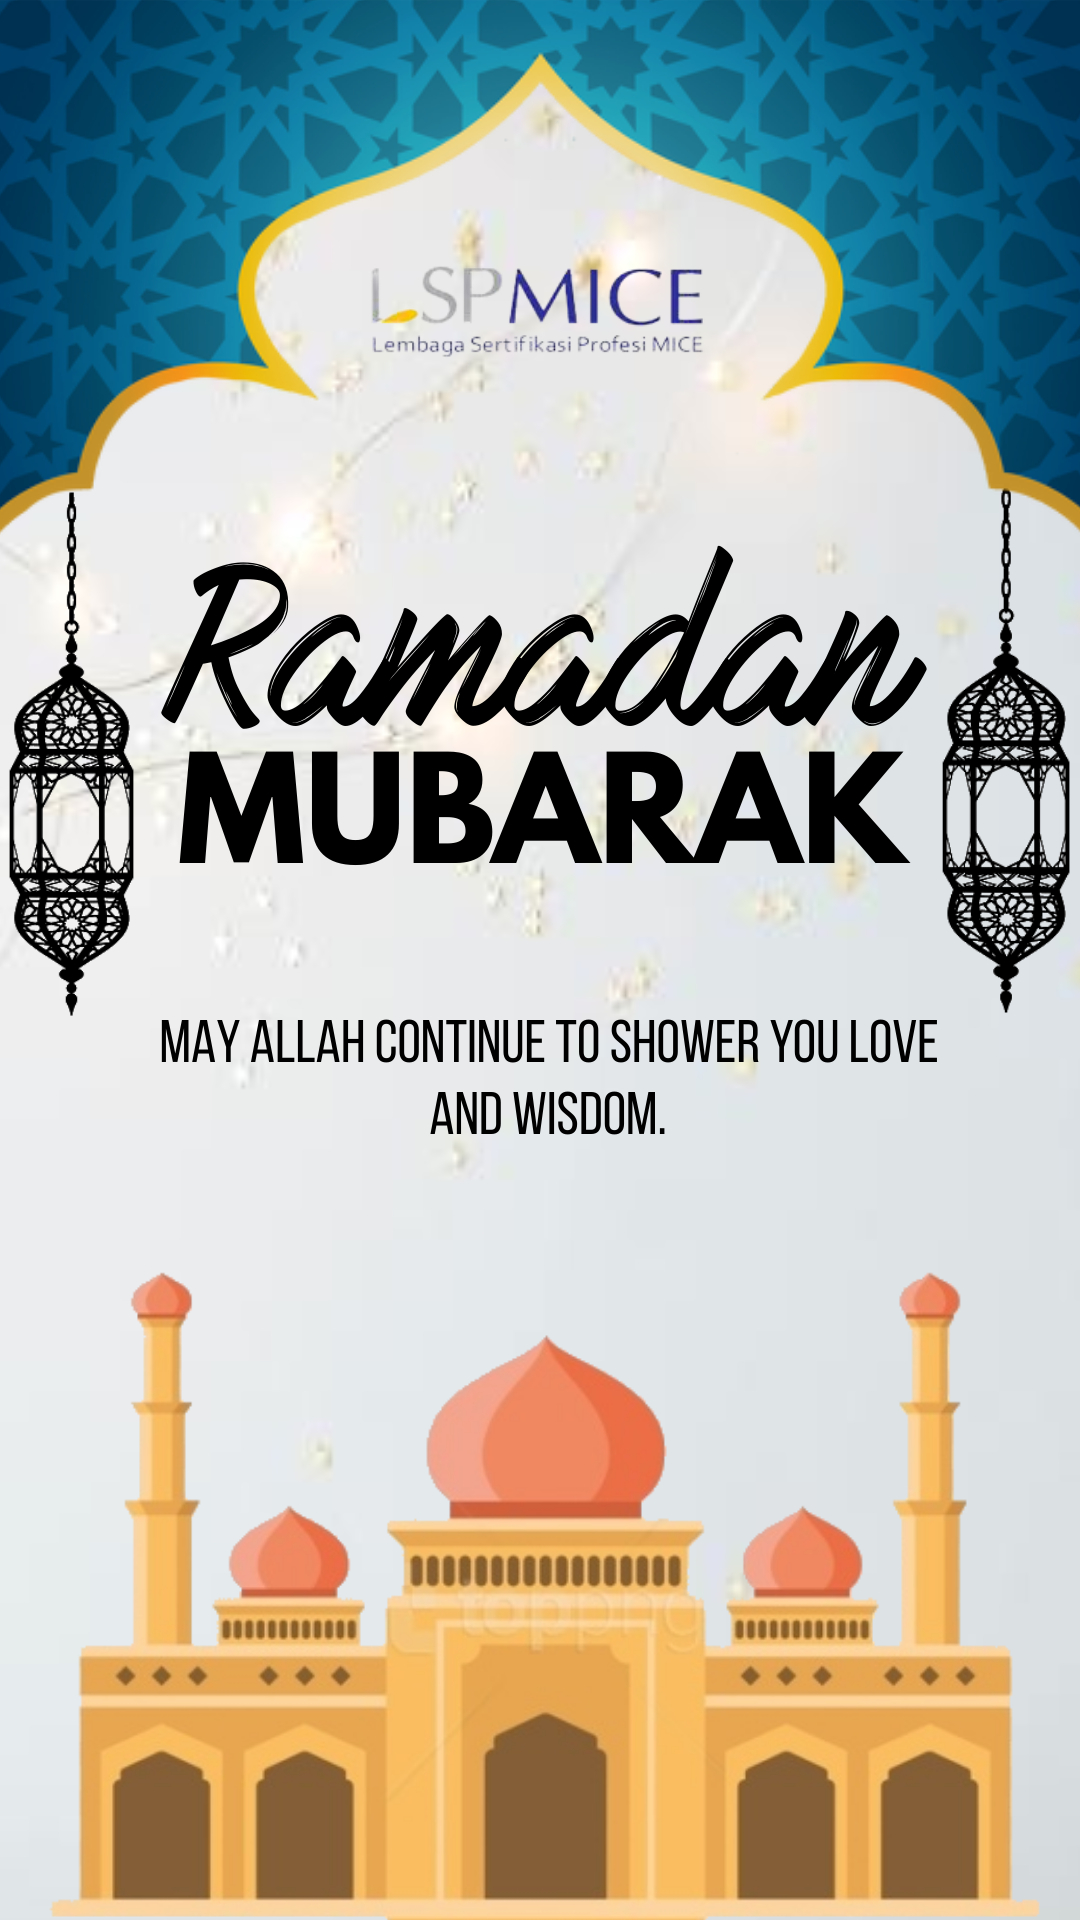 marhaban-ya-ramadhan-lsp-mice-2021